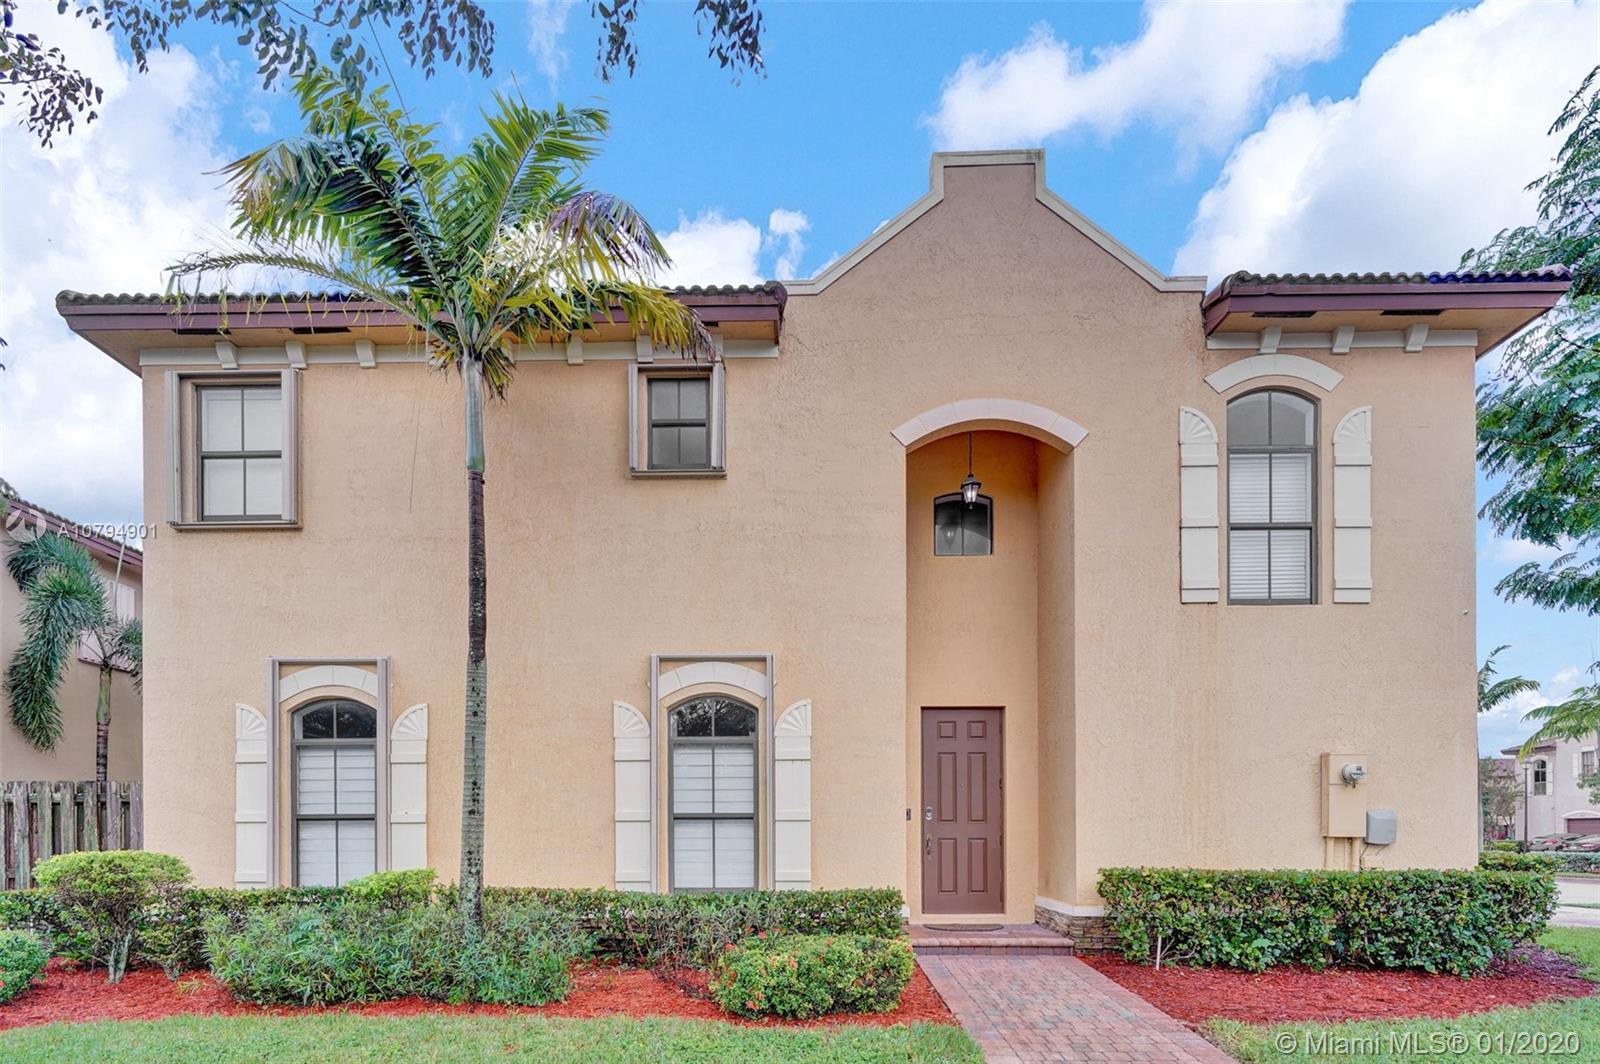 23603 SW 113th Ave #23603, Homestead, FL 33032 - Homestead, FL real estate listing